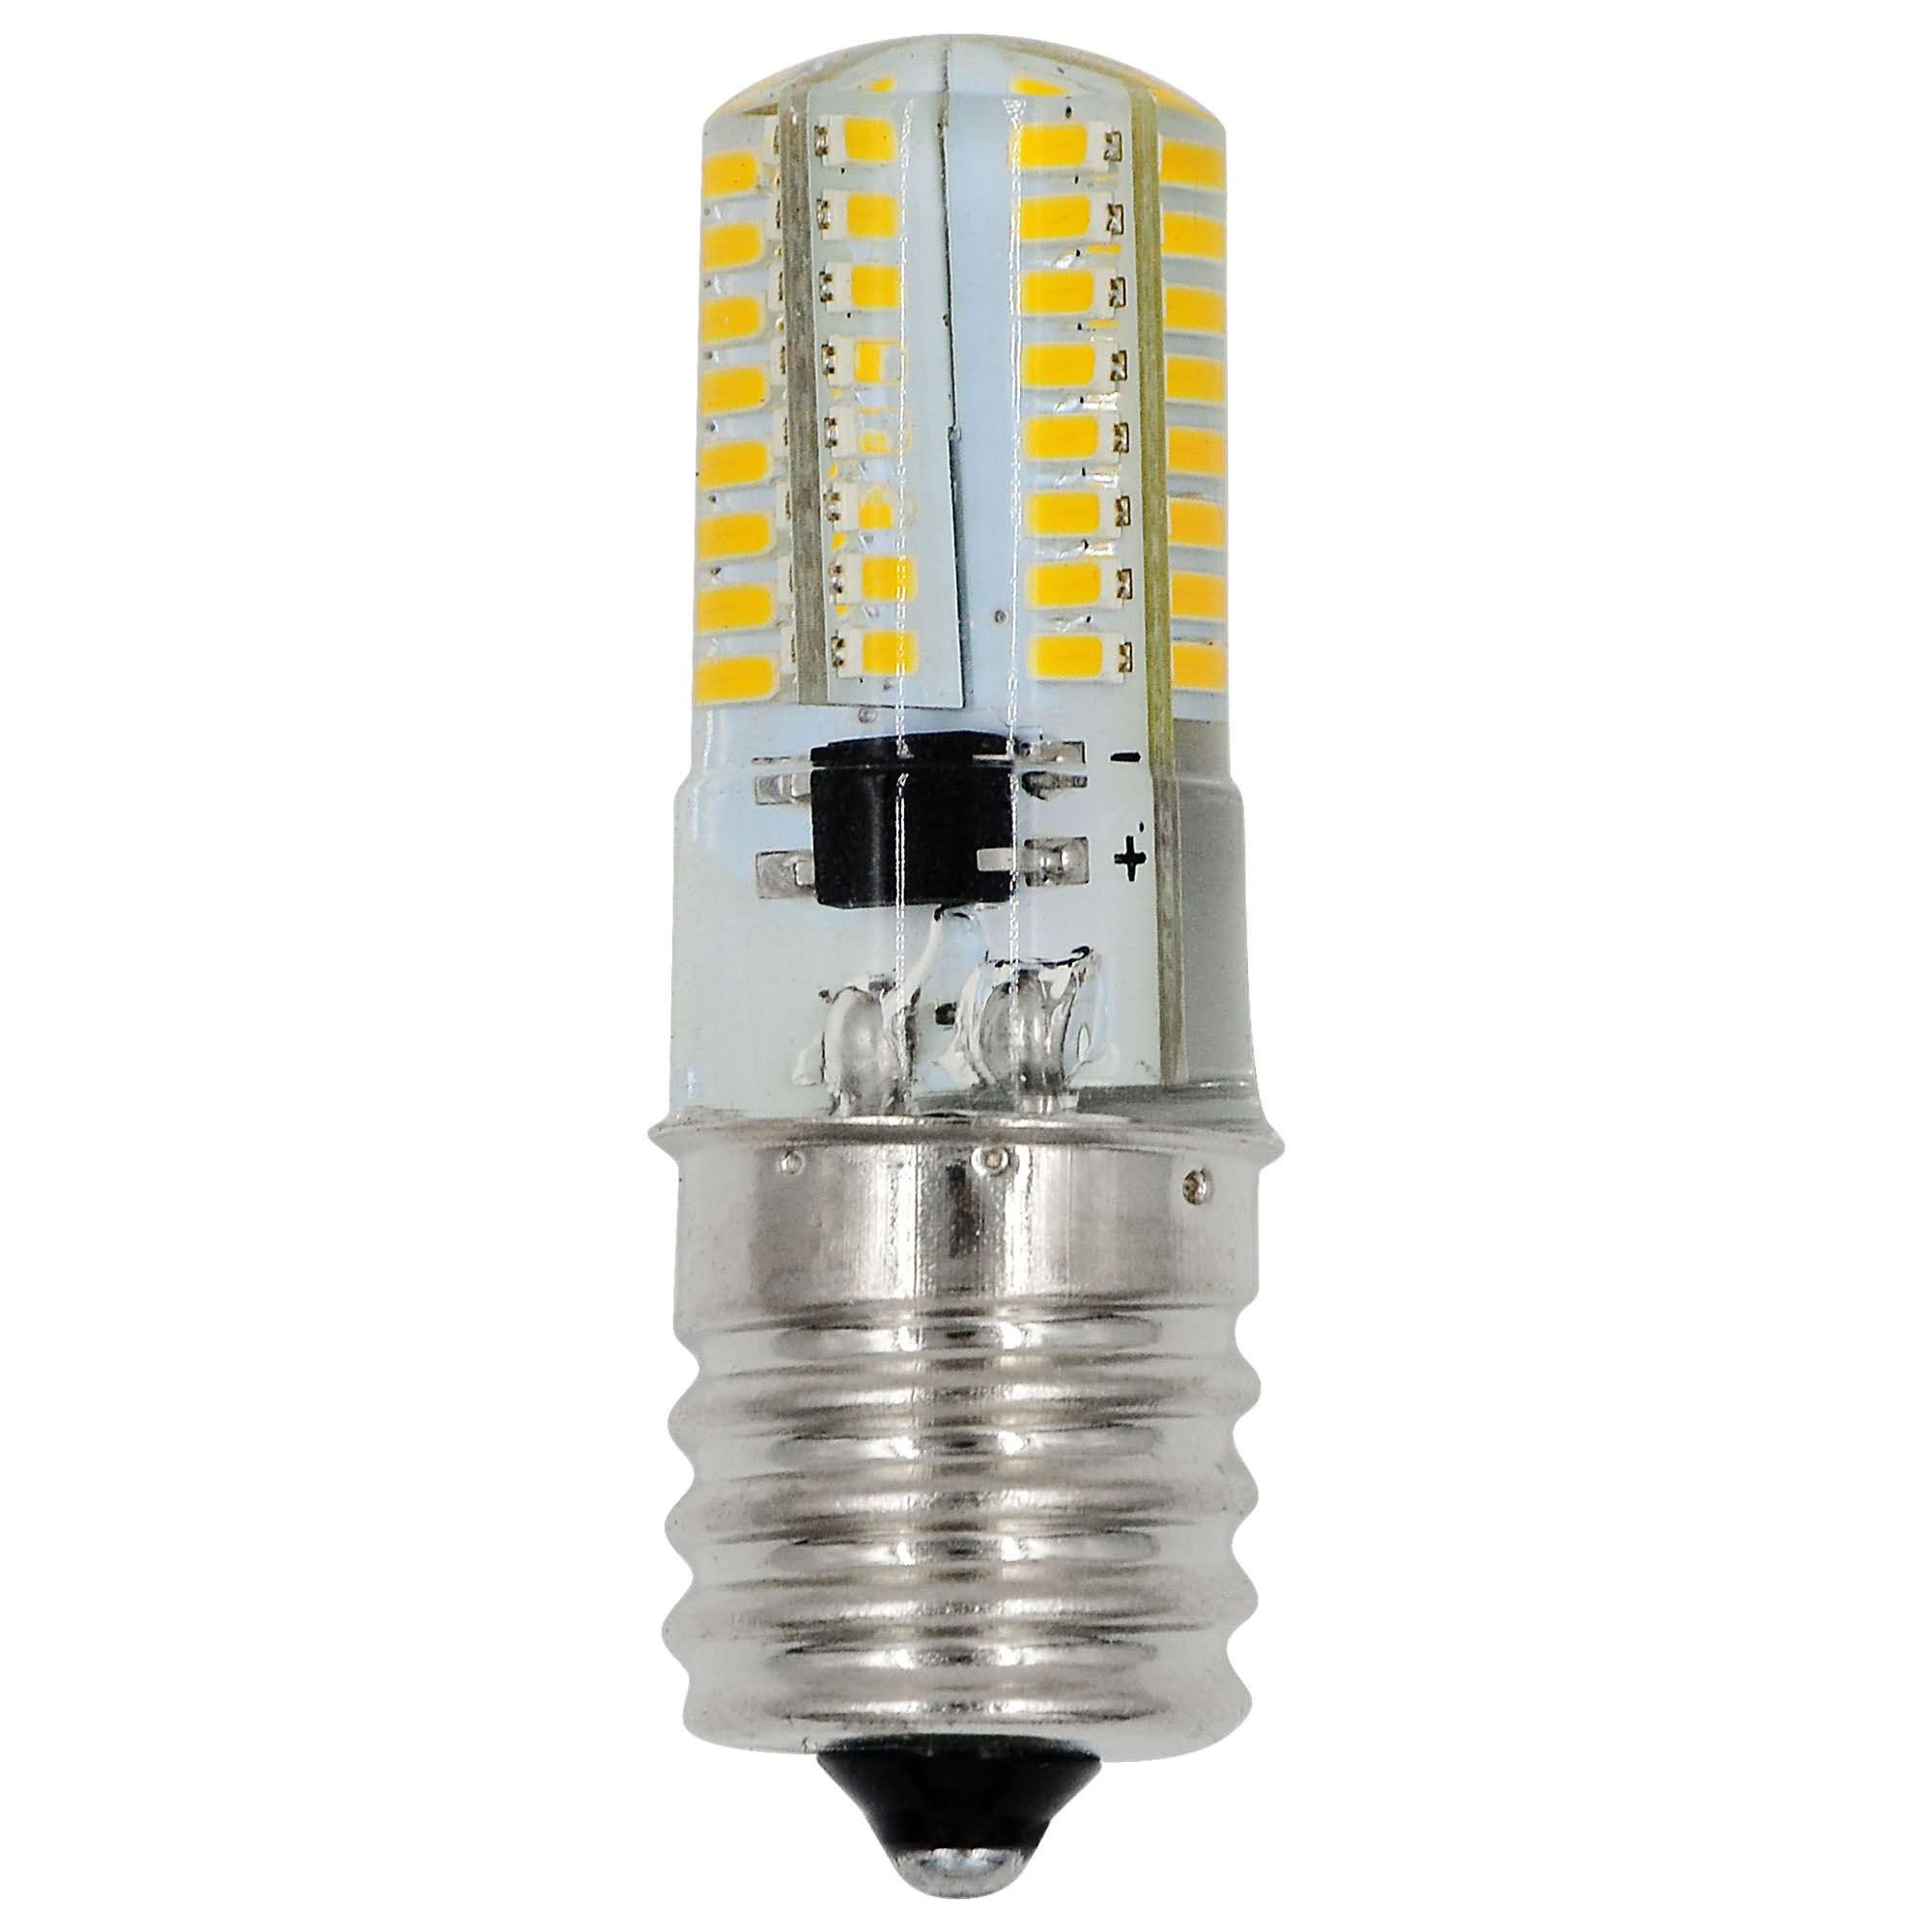 e17 3w led corn light 64x 3014 smd leds led lamp bulb in. Black Bedroom Furniture Sets. Home Design Ideas